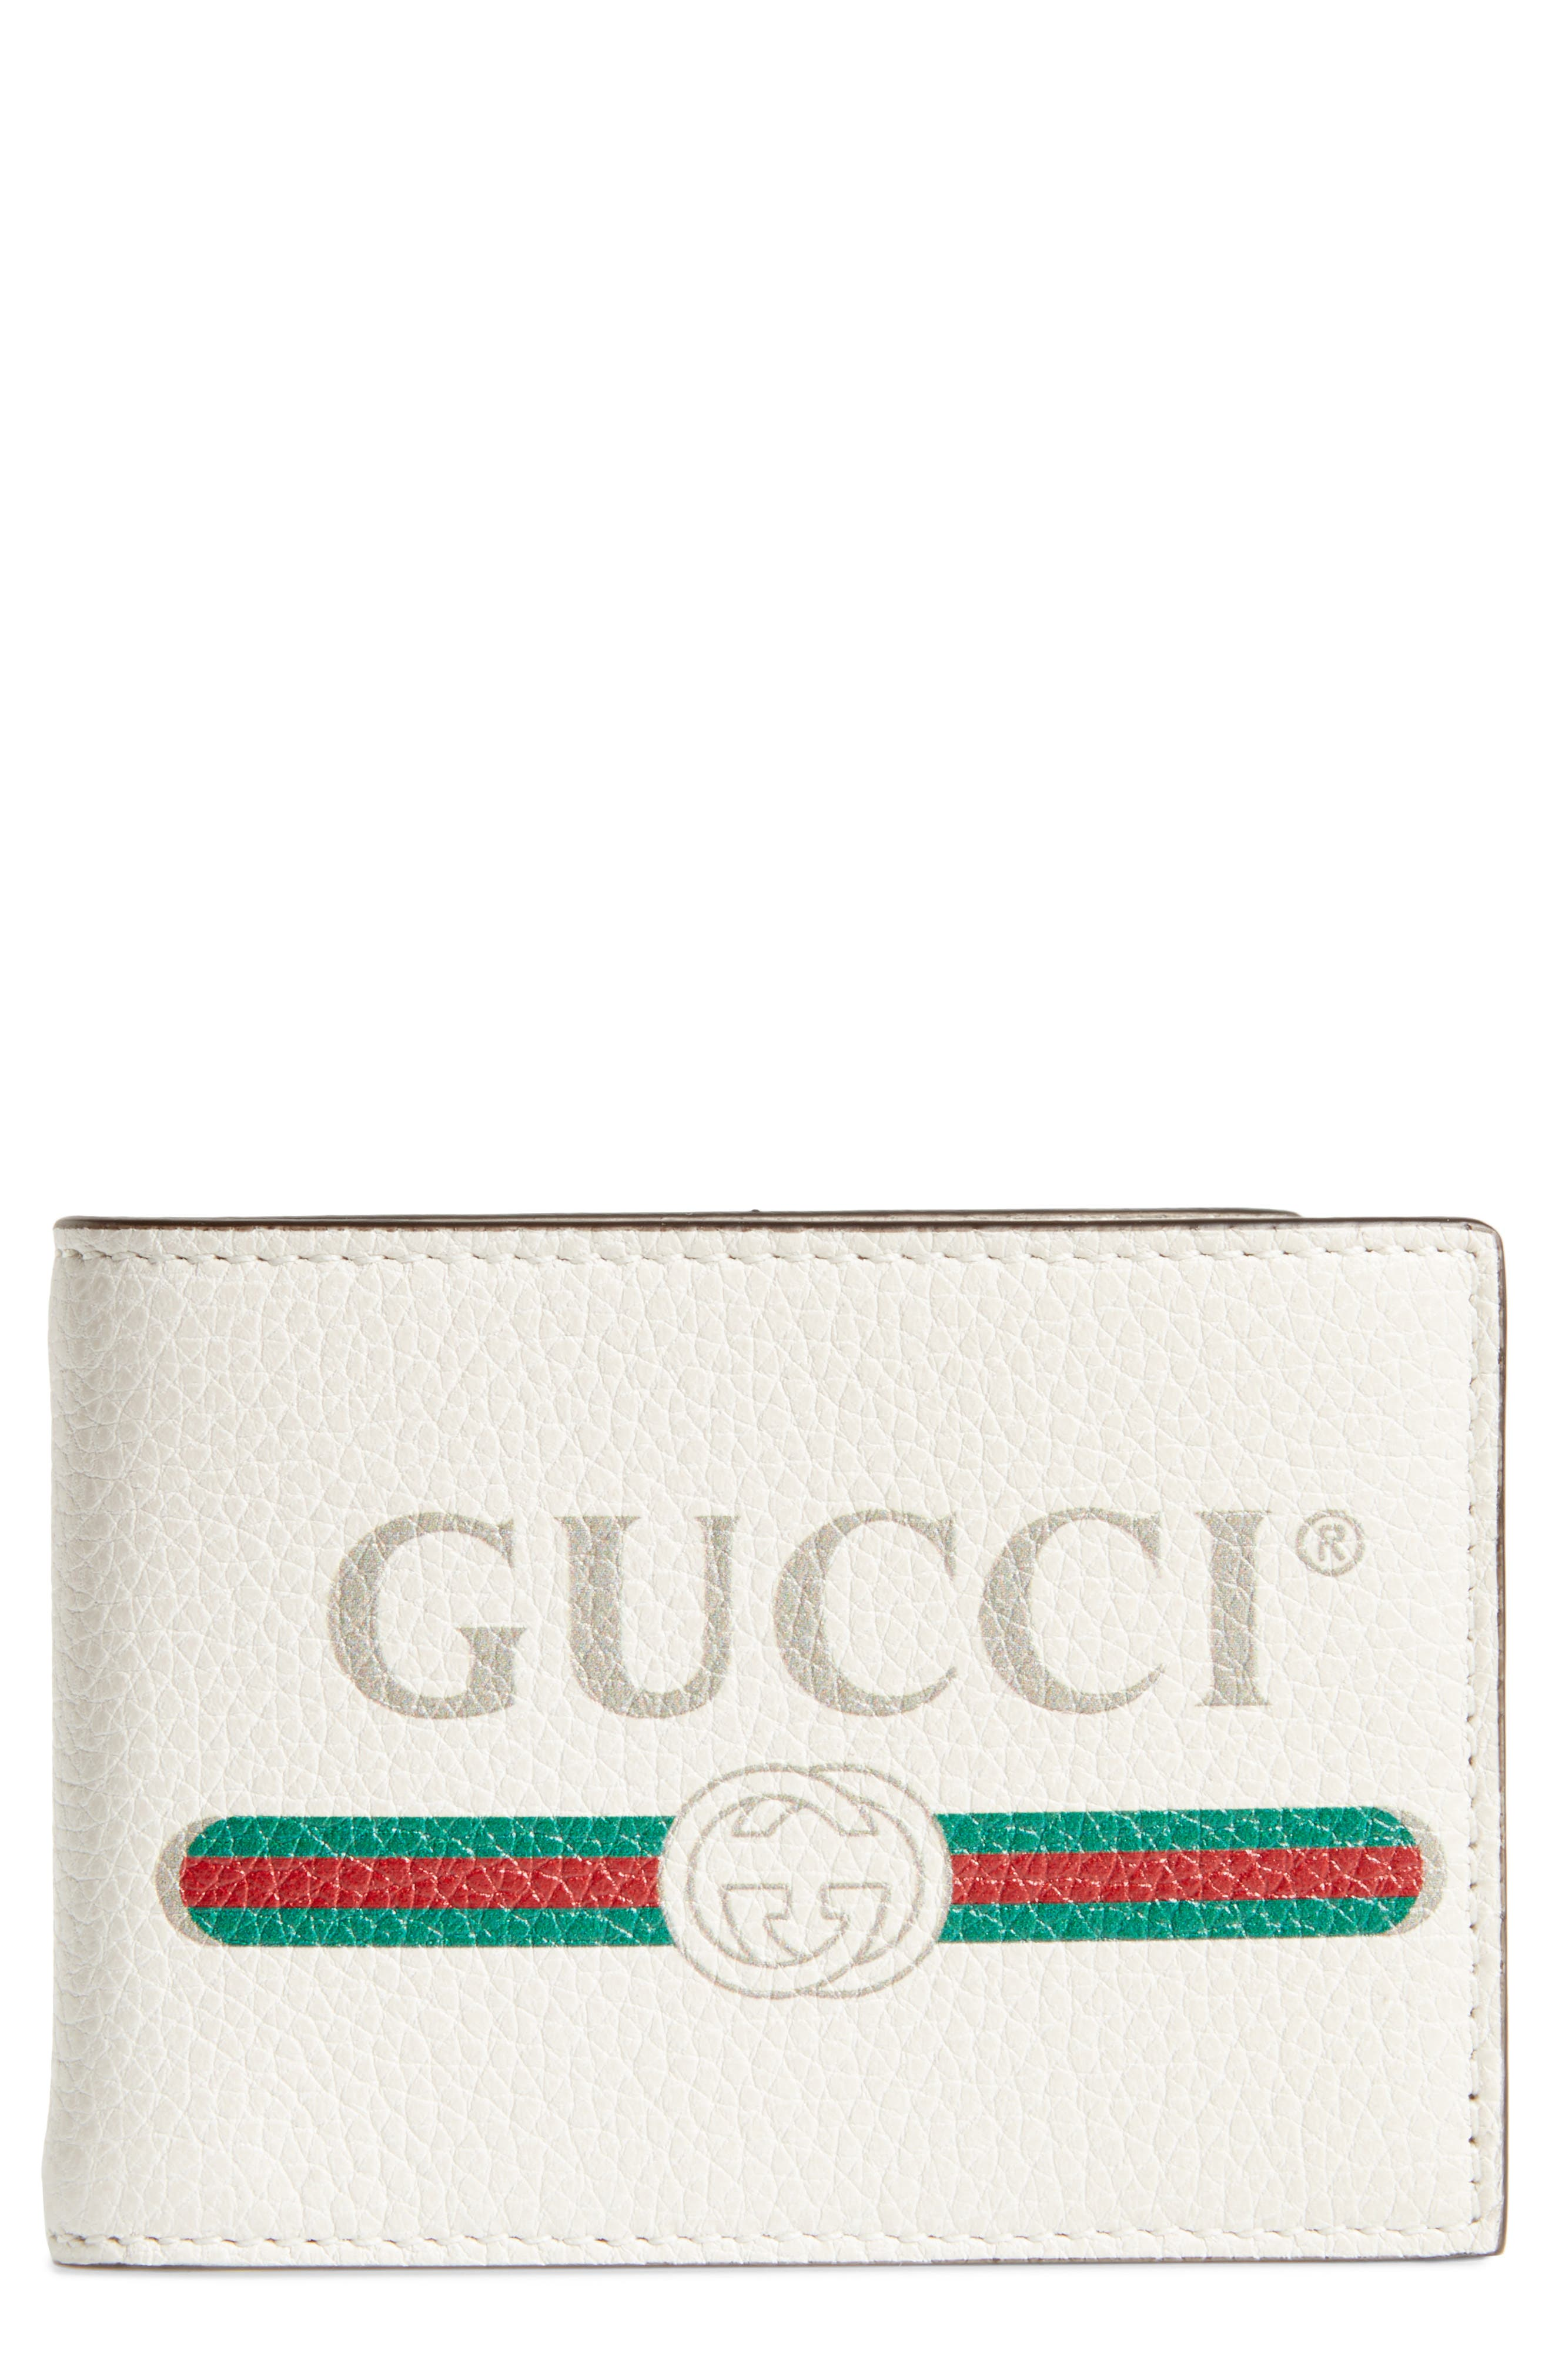 Wallet,                         Main,                         color, WHITE